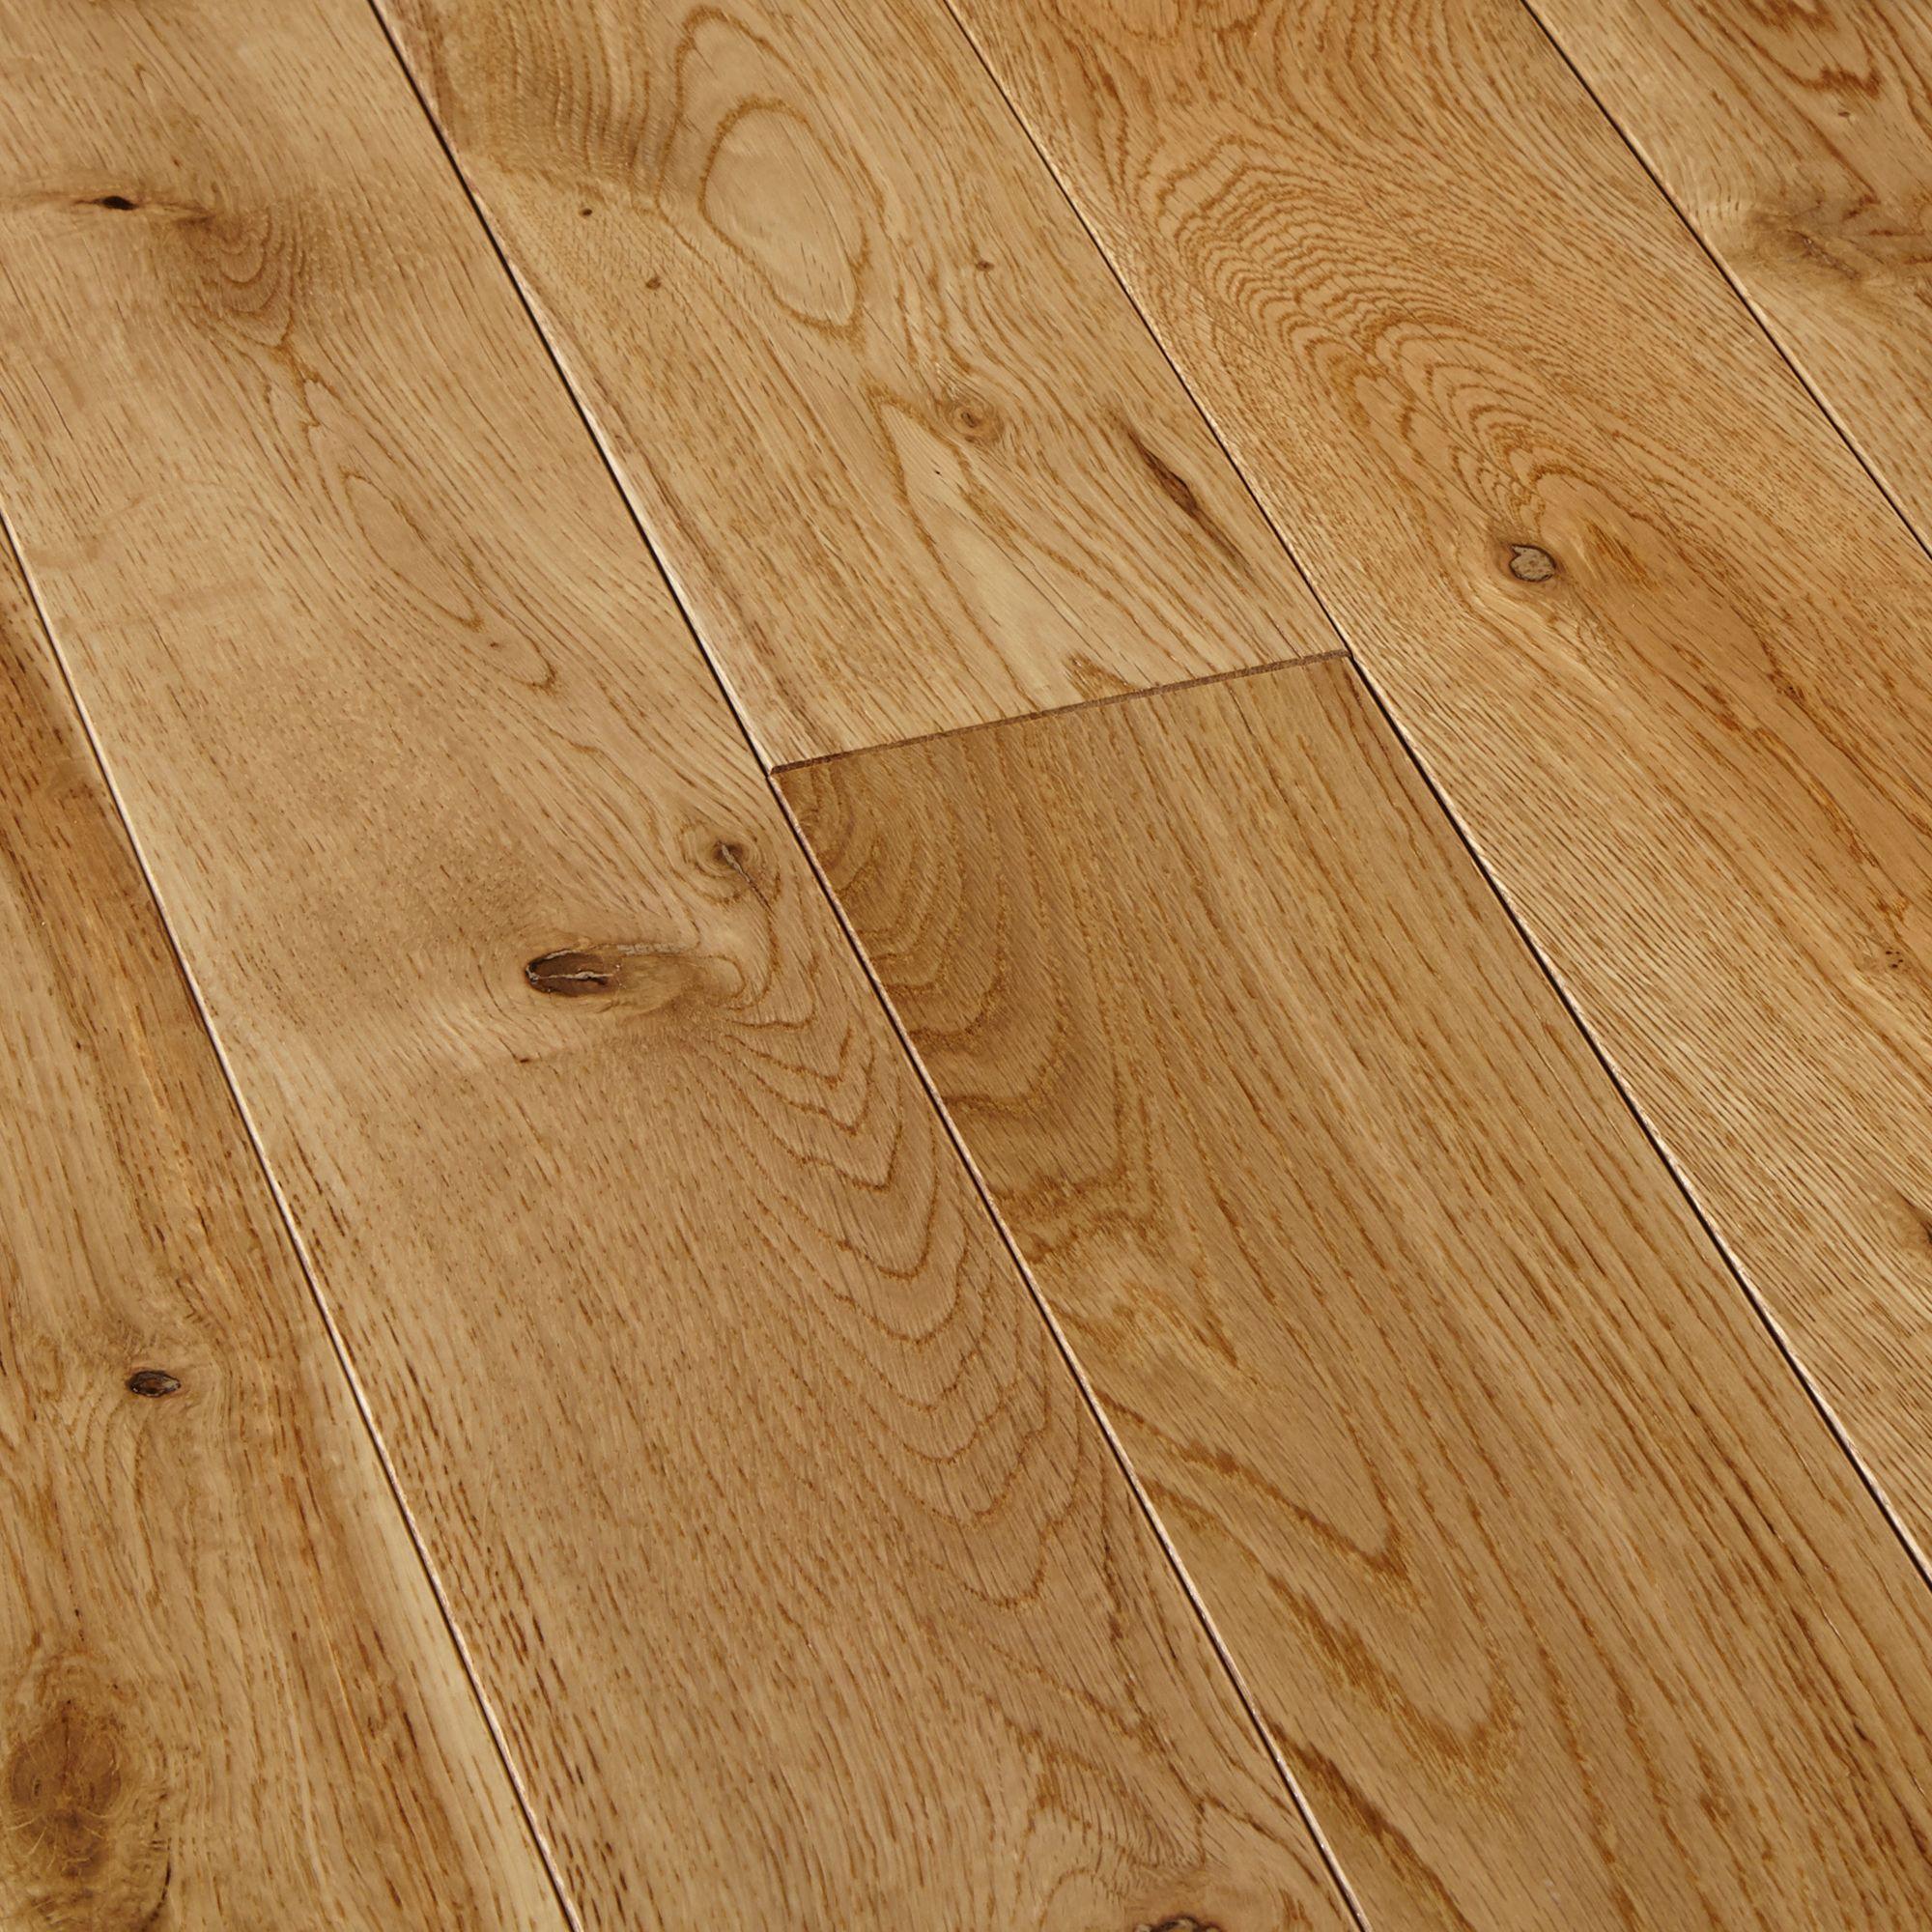 Colours Symphonia Natural Solid Wood Flooring 1.3 m Pack | Departments |  DIY at B&Q